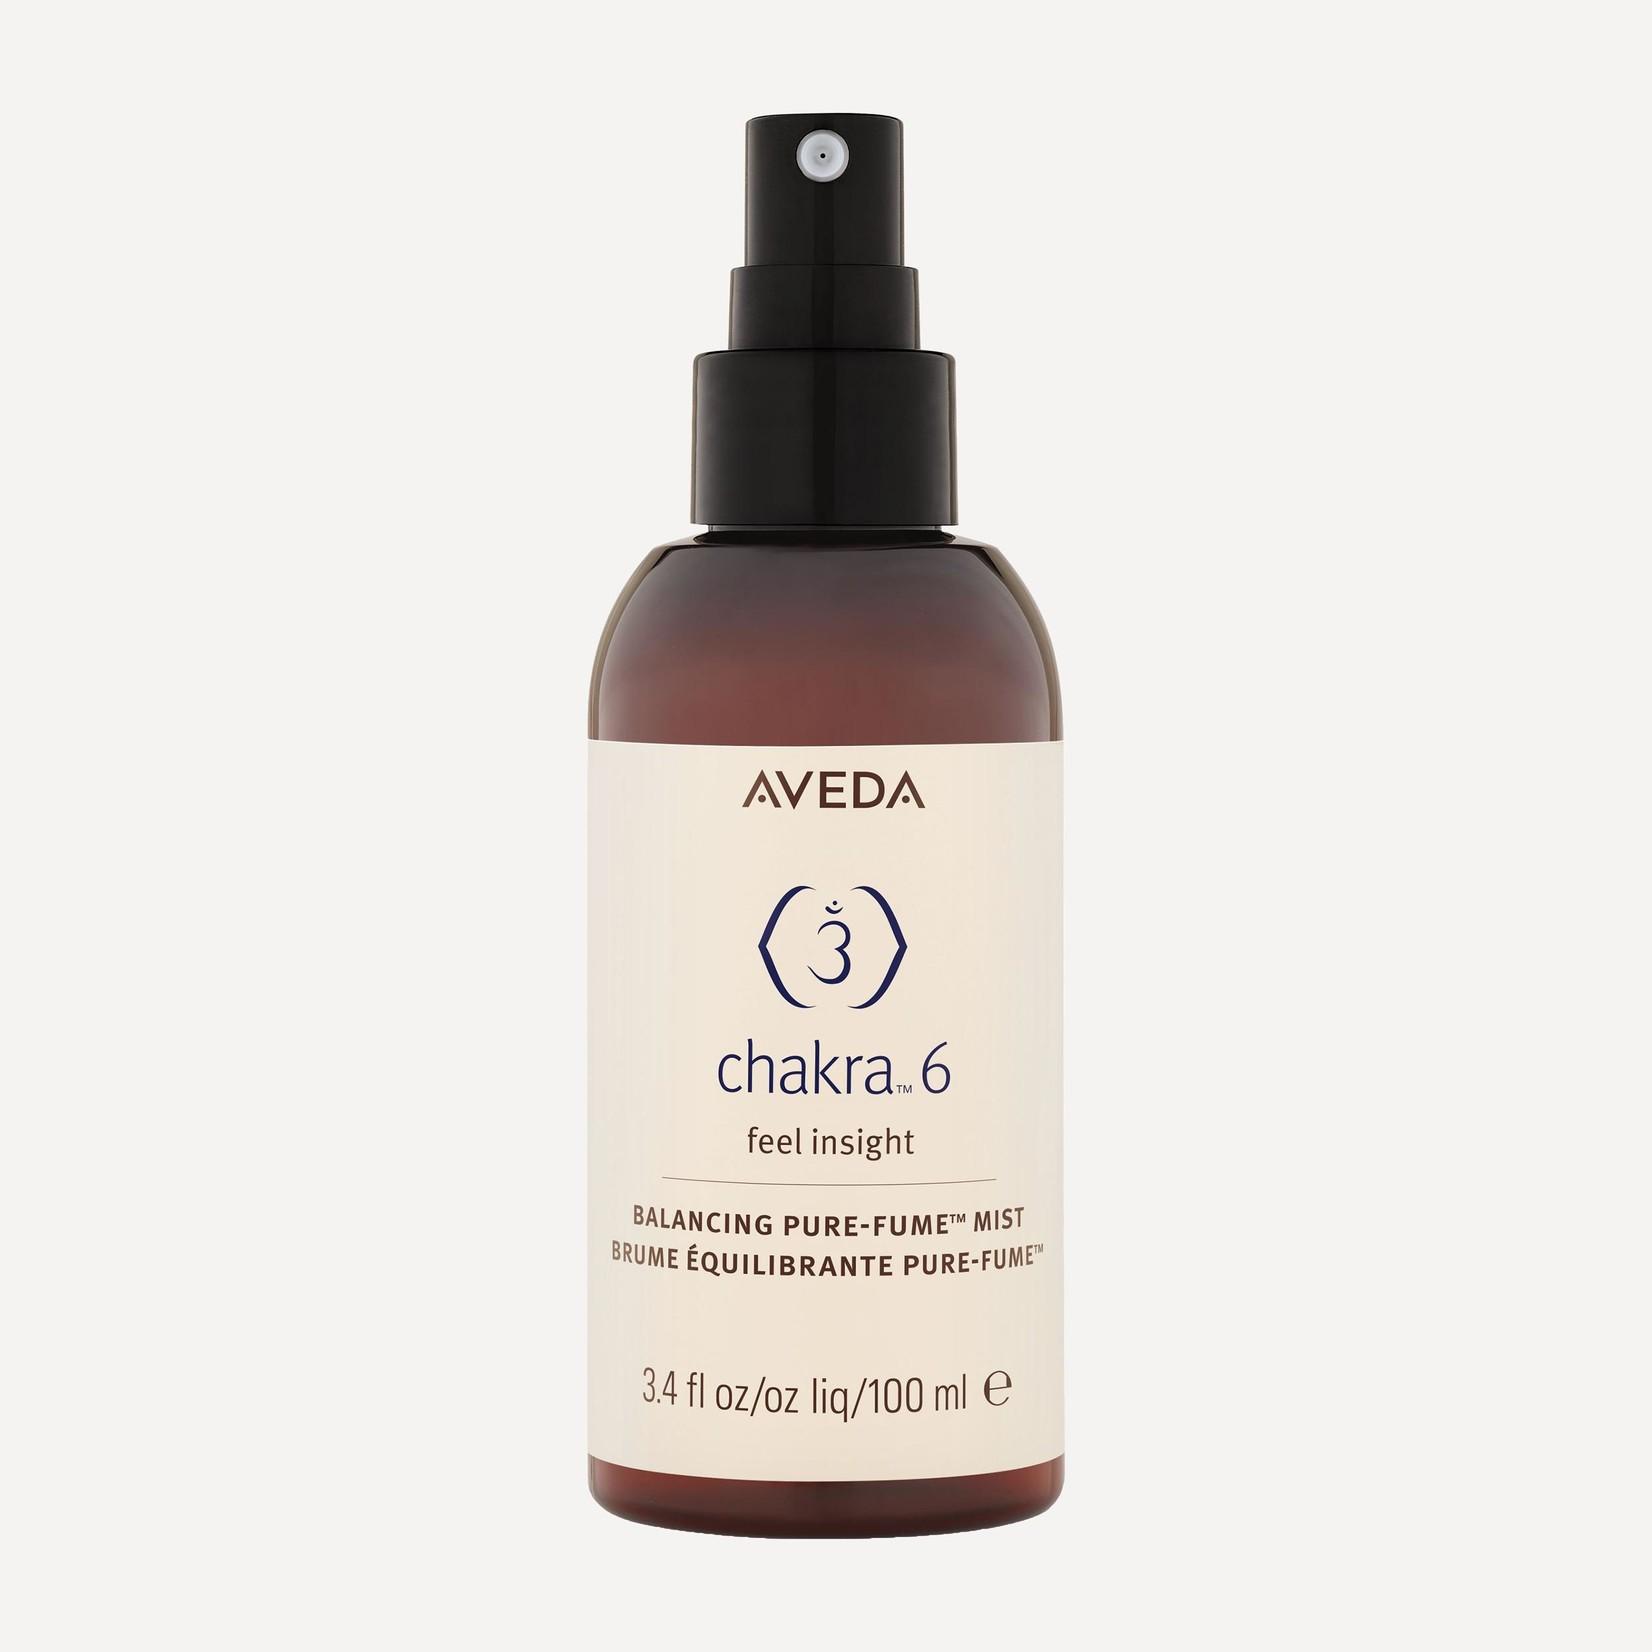 AVEDA Chakra Balancing Pure-Fume™ Mist